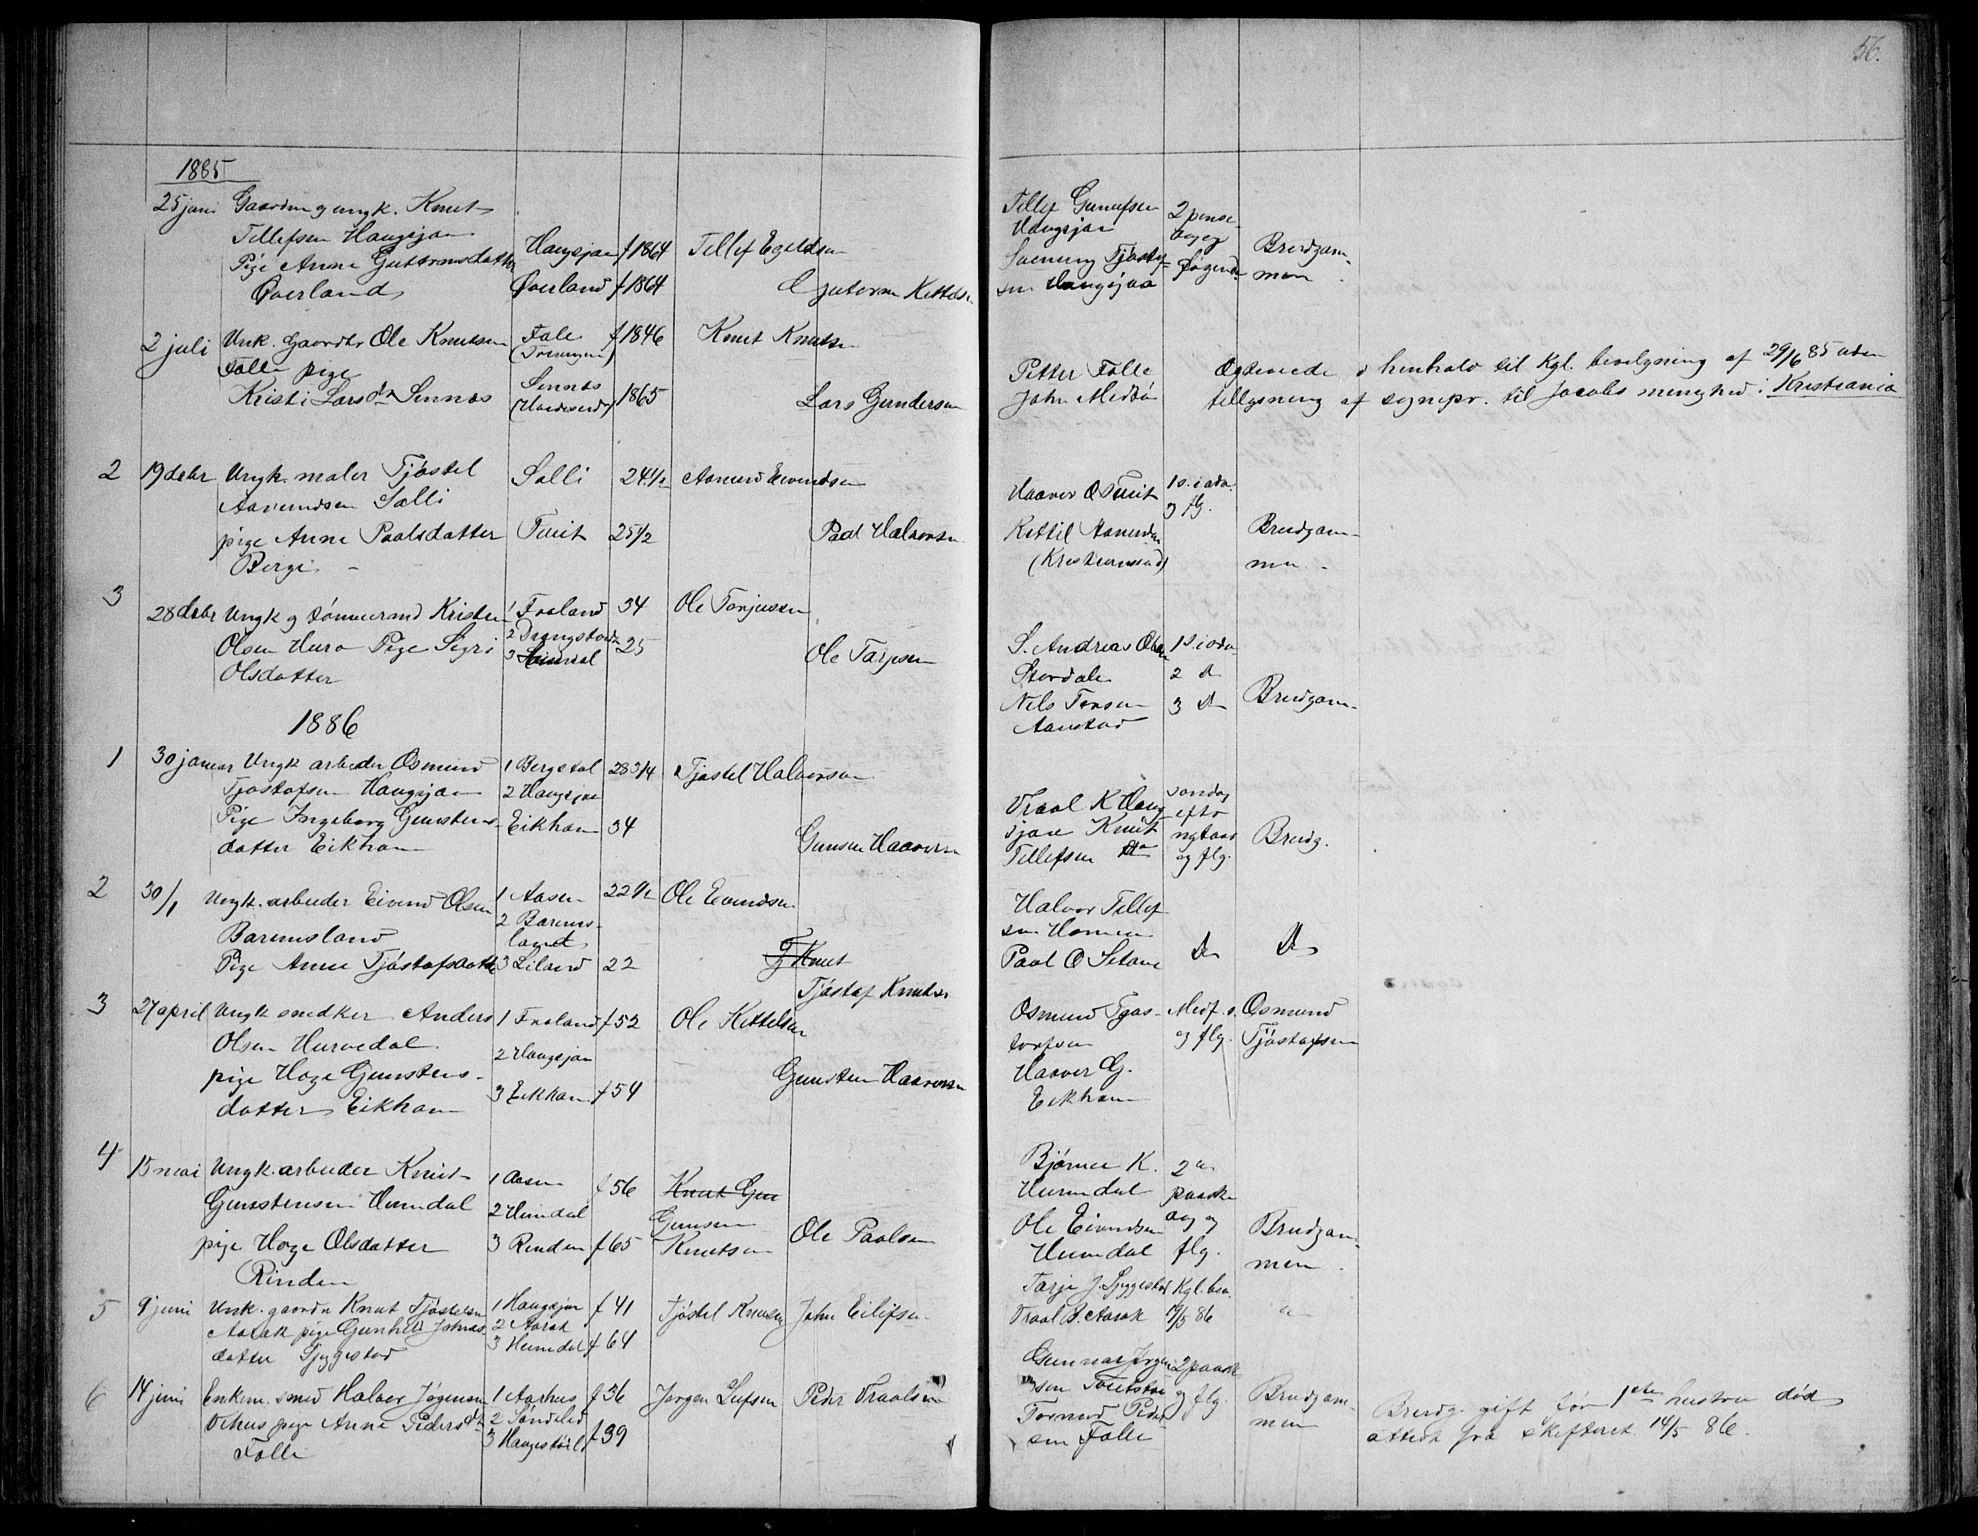 SAKO, Nissedal kirkebøker, G/Gb/L0002: Klokkerbok nr. II 2, 1863-1892, s. 56